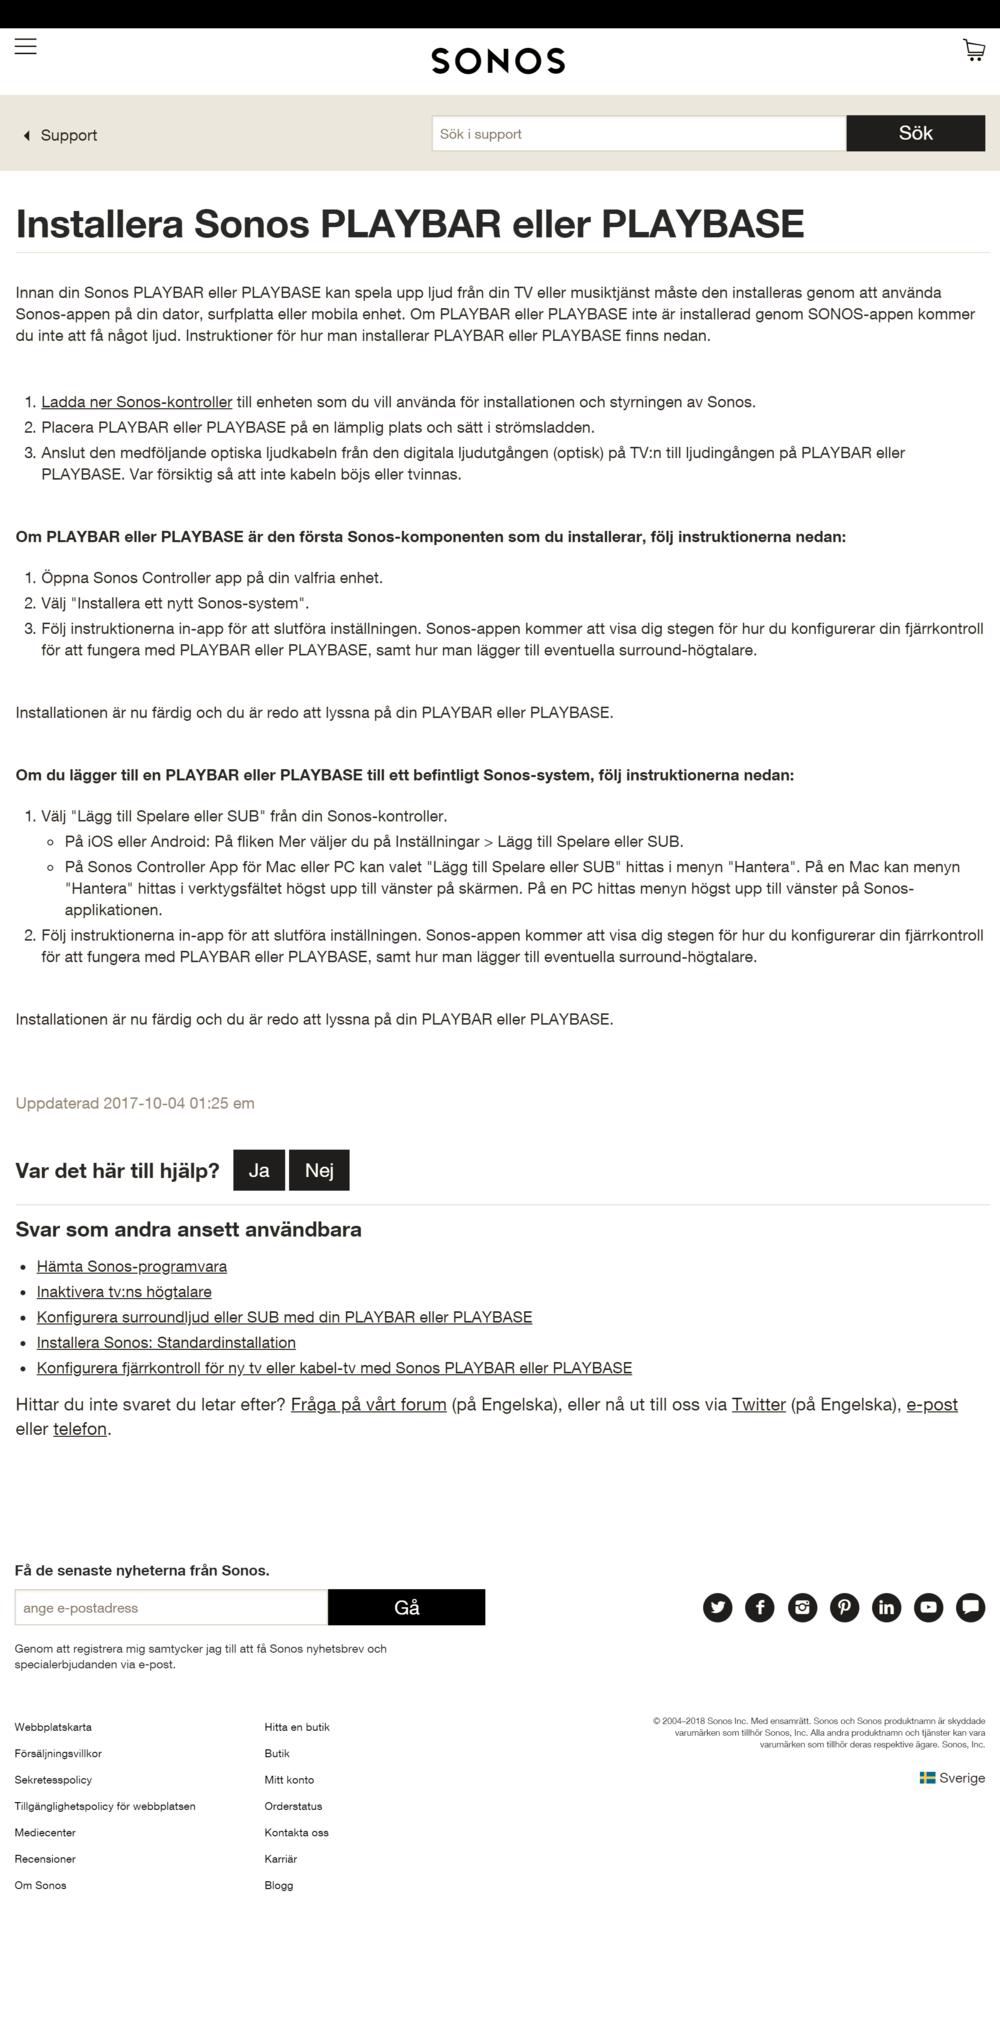 sonos-sv.custhelp.com_app_answers_detail_(iPad Pro) (1).png